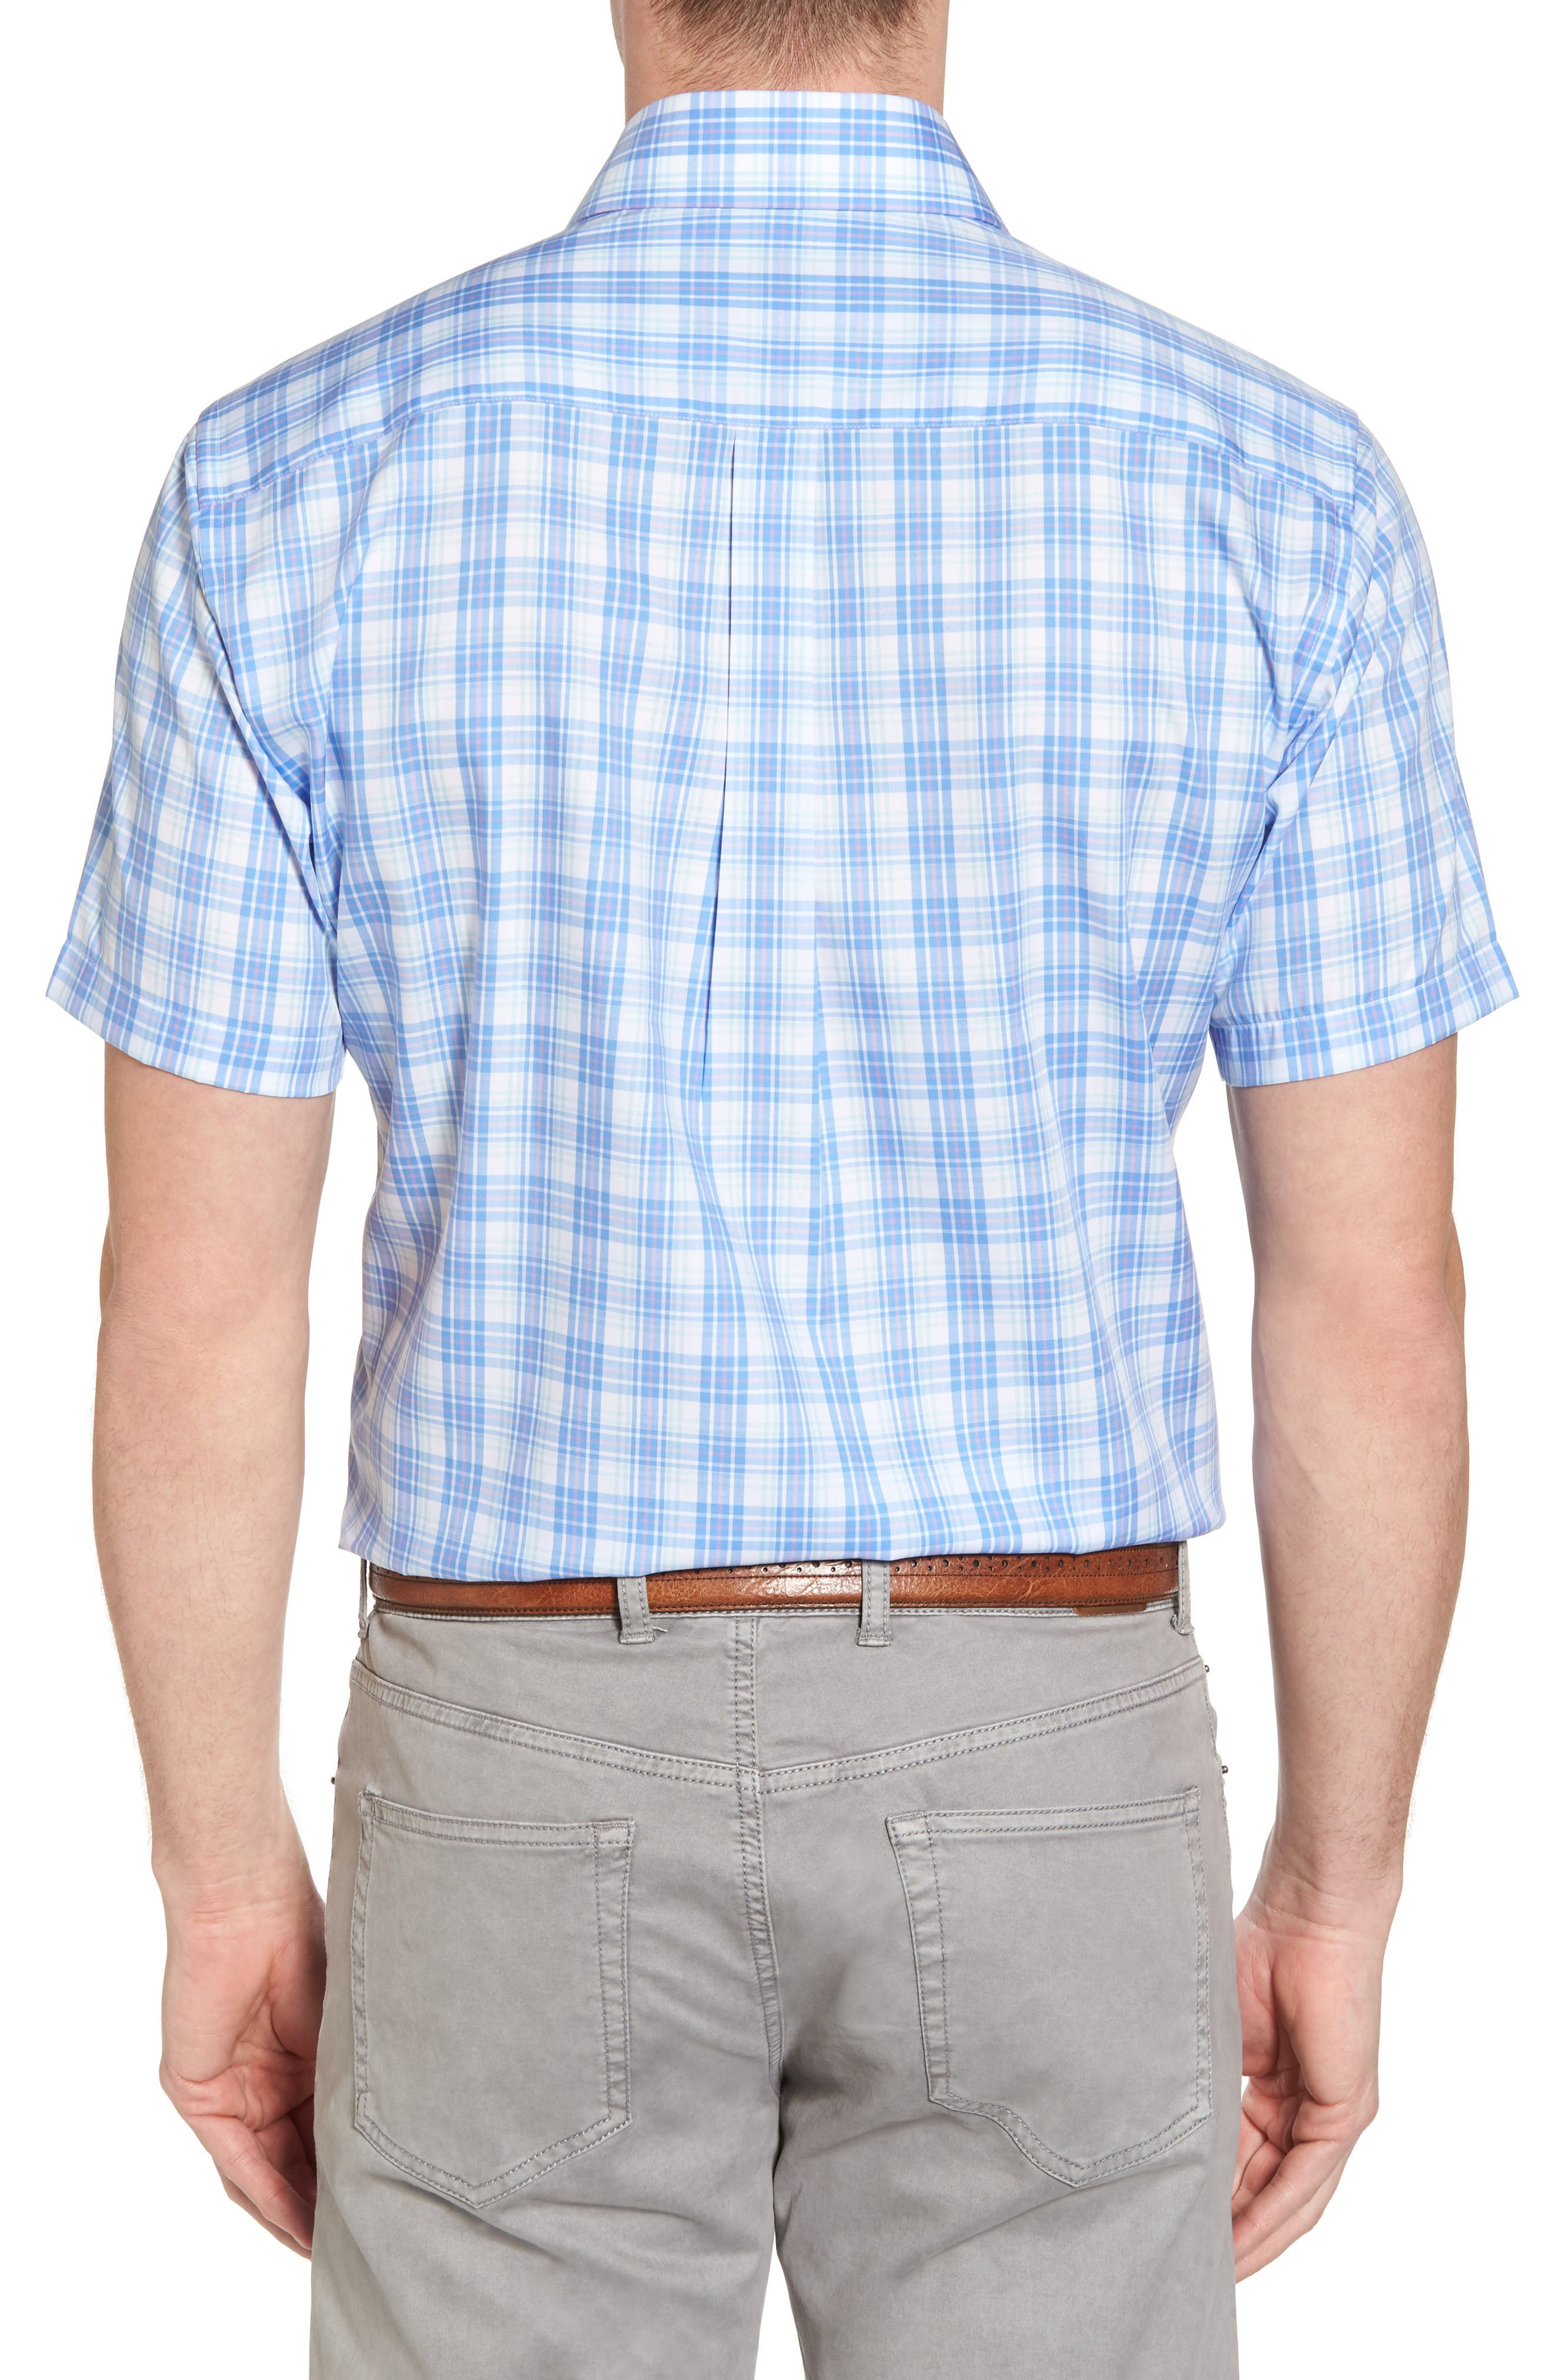 Crown Ease Sloan Regular Fit Plaid Sport Shirt,                             Alternate thumbnail 2, color,                             Atlas Blue